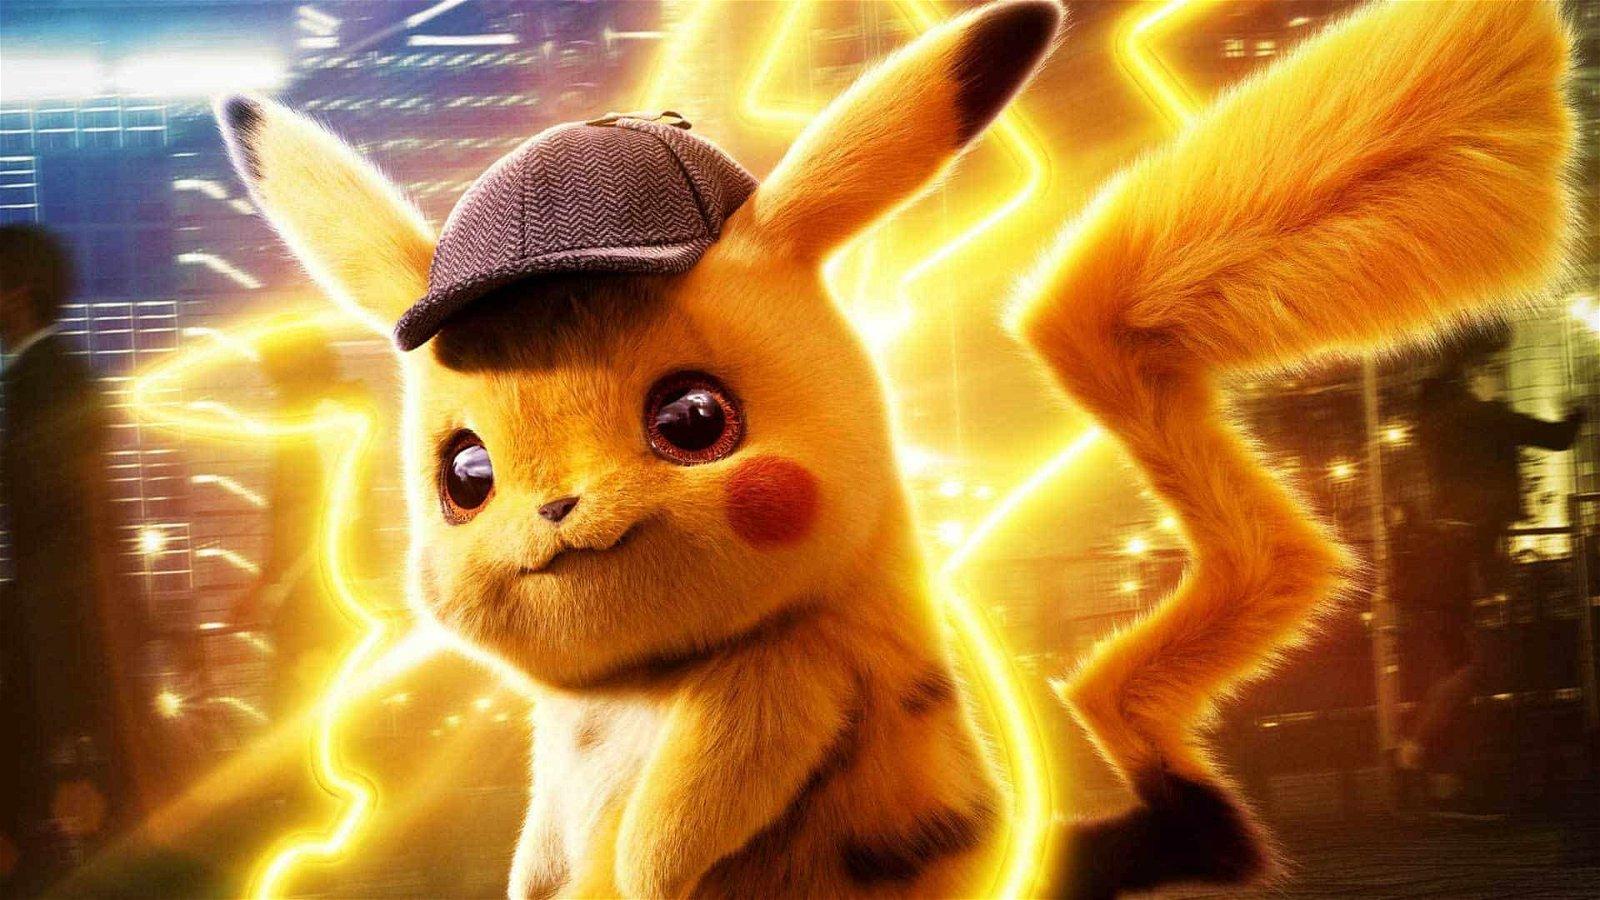 Pokémon: Detective Pikachu (2019) Review 2